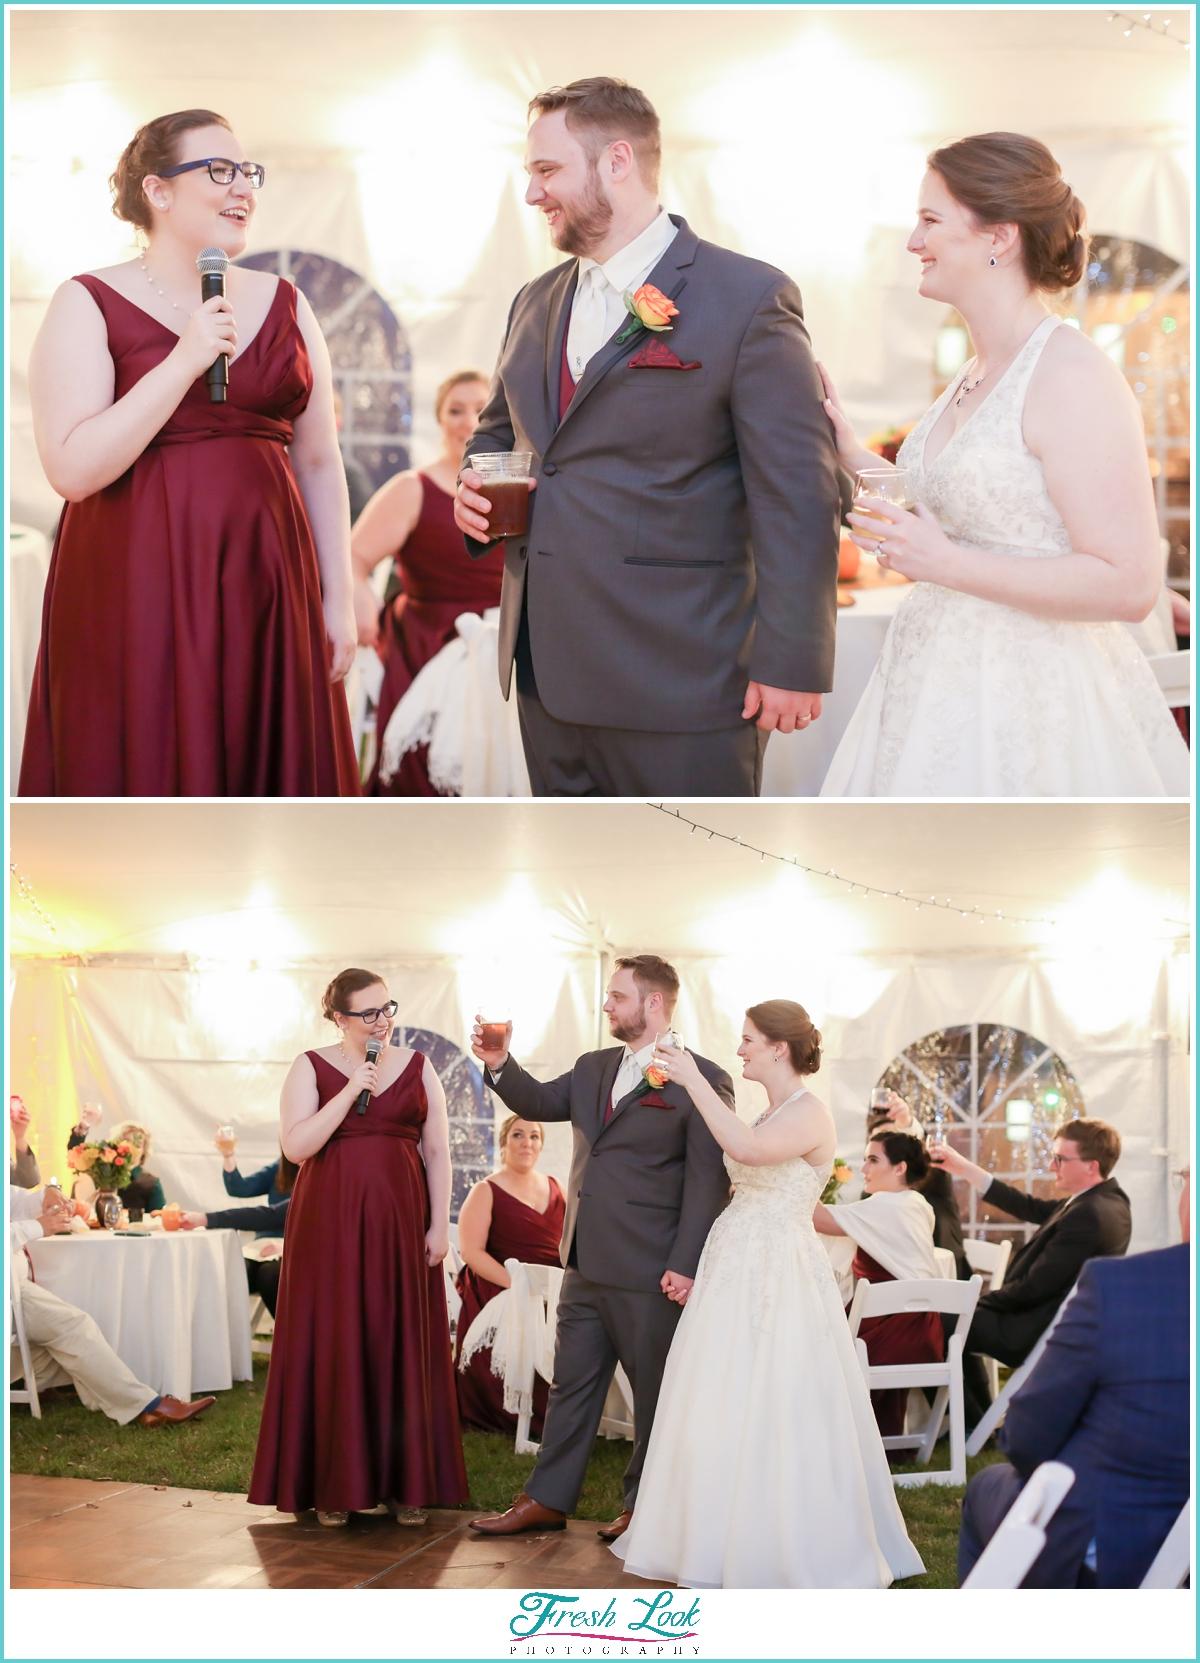 bridesmaid toast to bride and groom